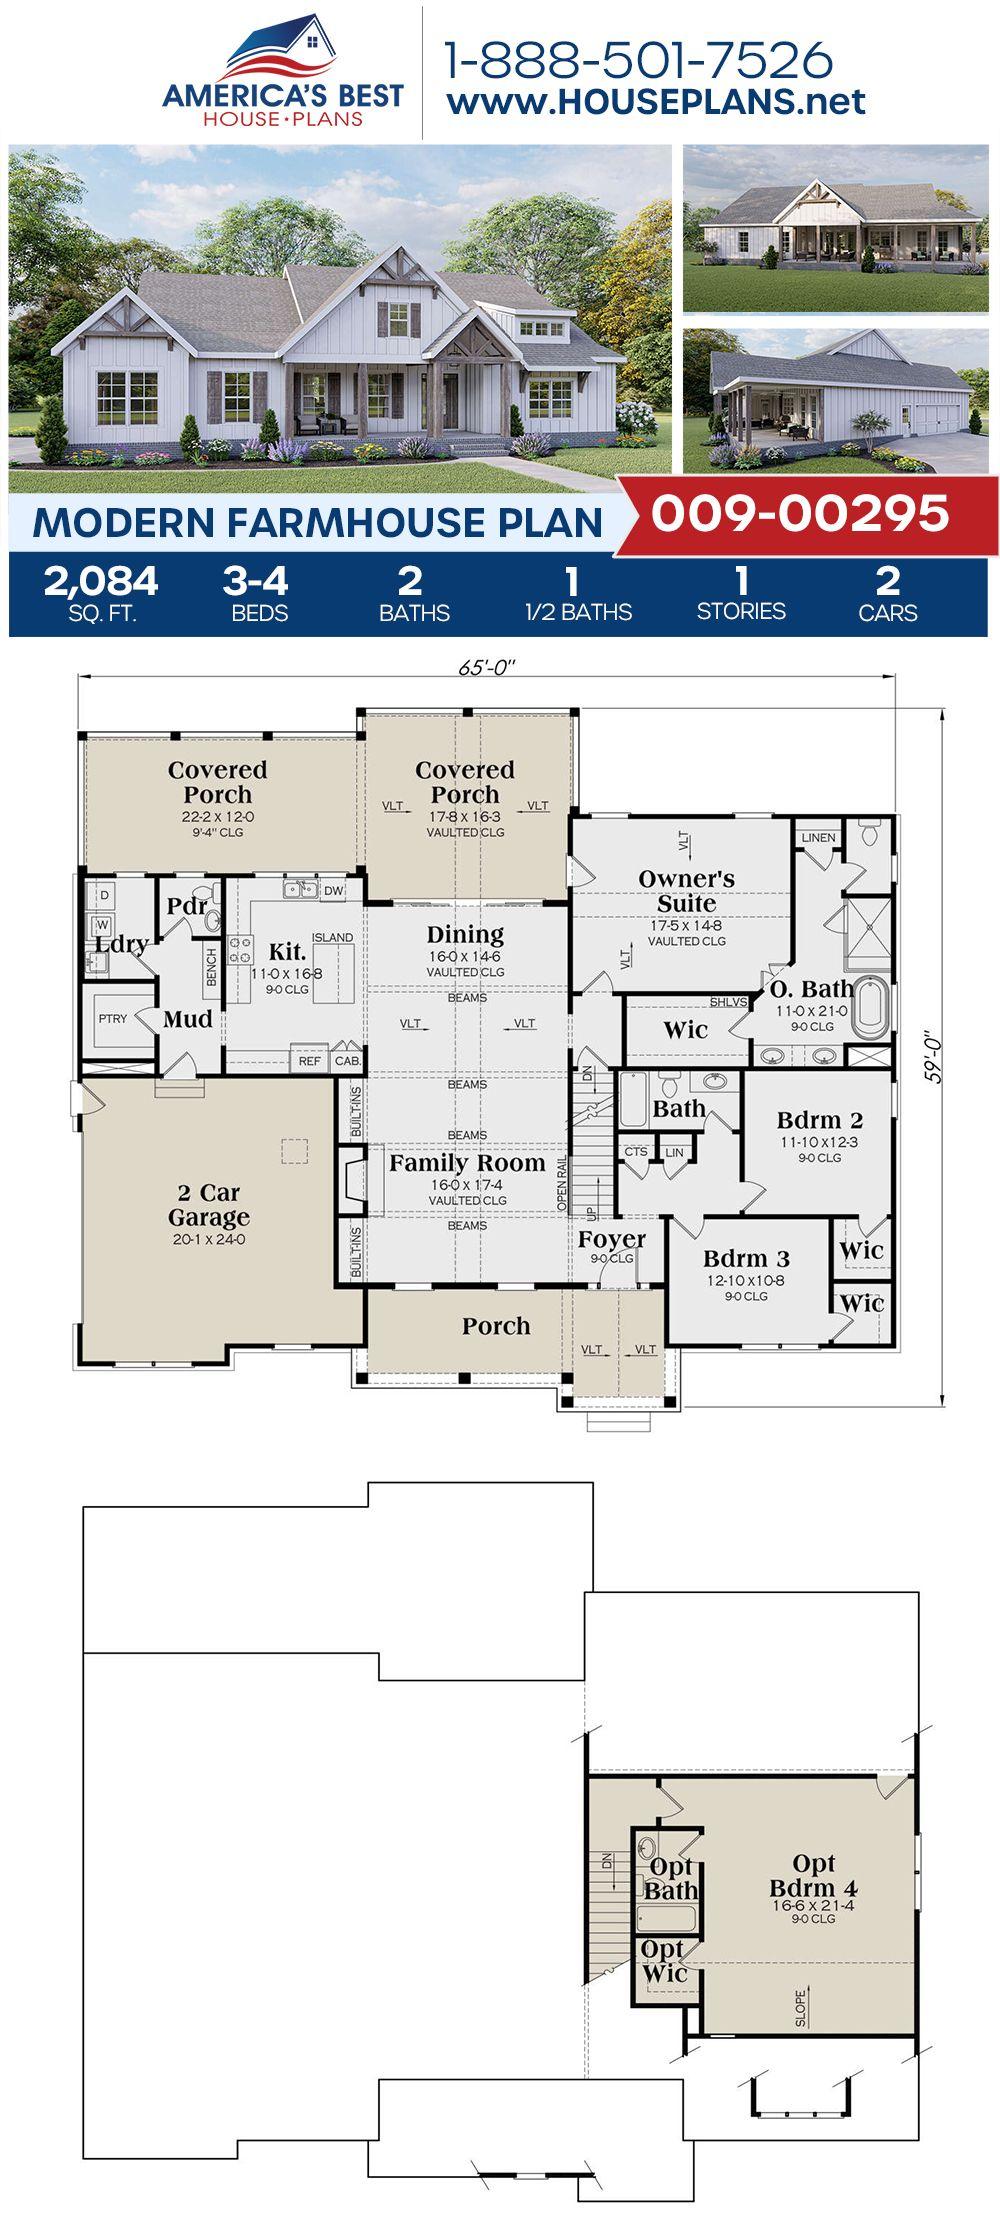 House Plan 009 00295 Modern Farmhouse Plan 2 084 Square Feet 3 4 Bedrooms 2 5 Bathrooms Modern Farmhouse Plans Farmhouse Plans Architectural Design House Plans